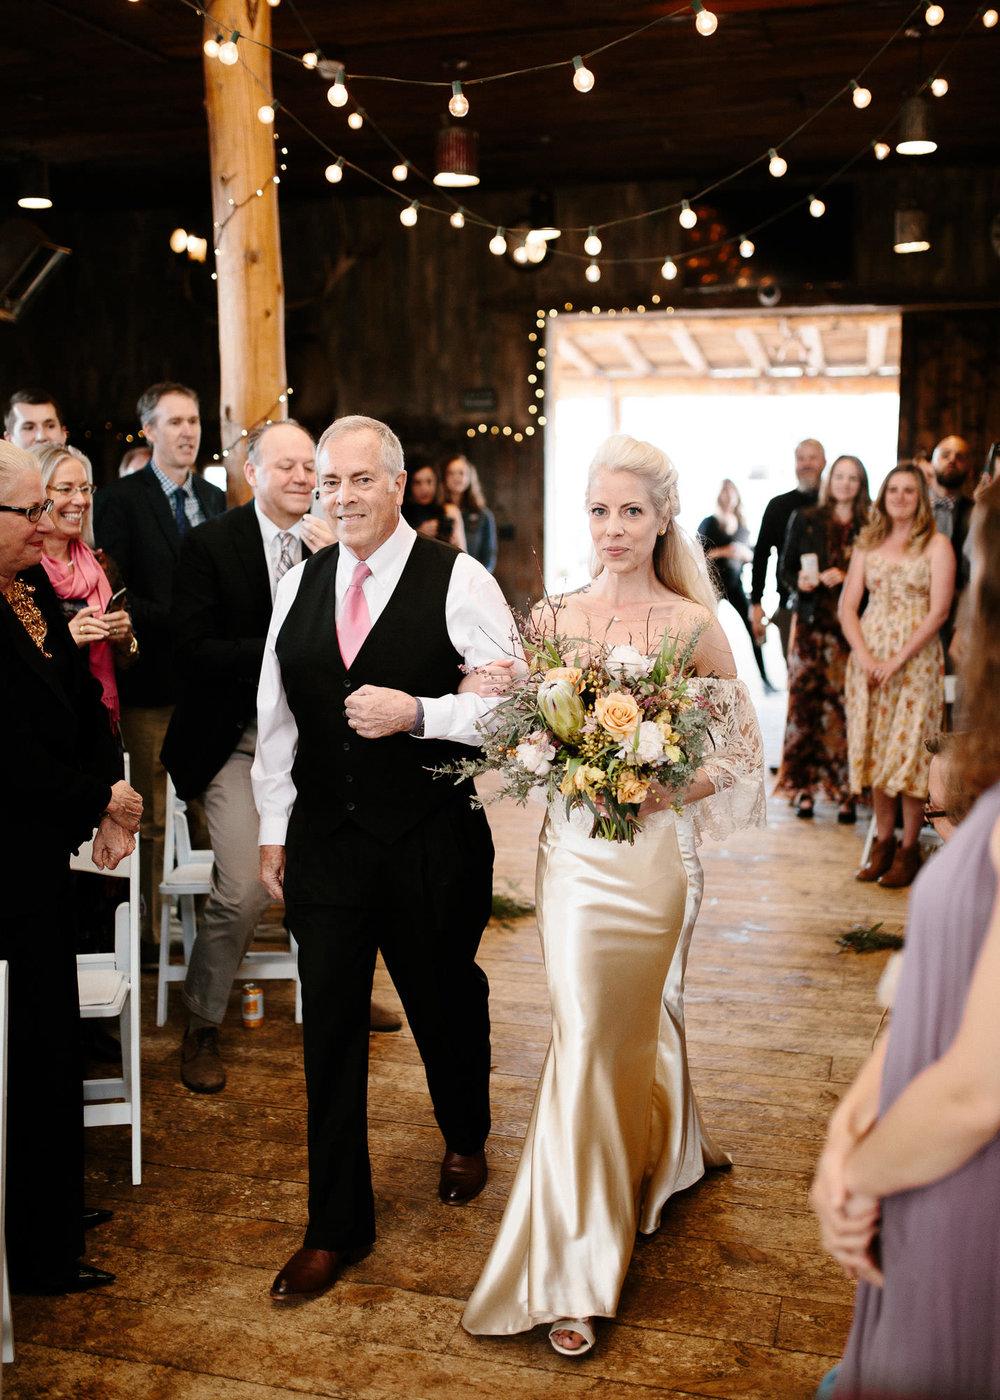 bucci-barn-wedding-elopement-evergreen-boulder-denver-colorado-adventerous-romantic-timeless-058.jpg